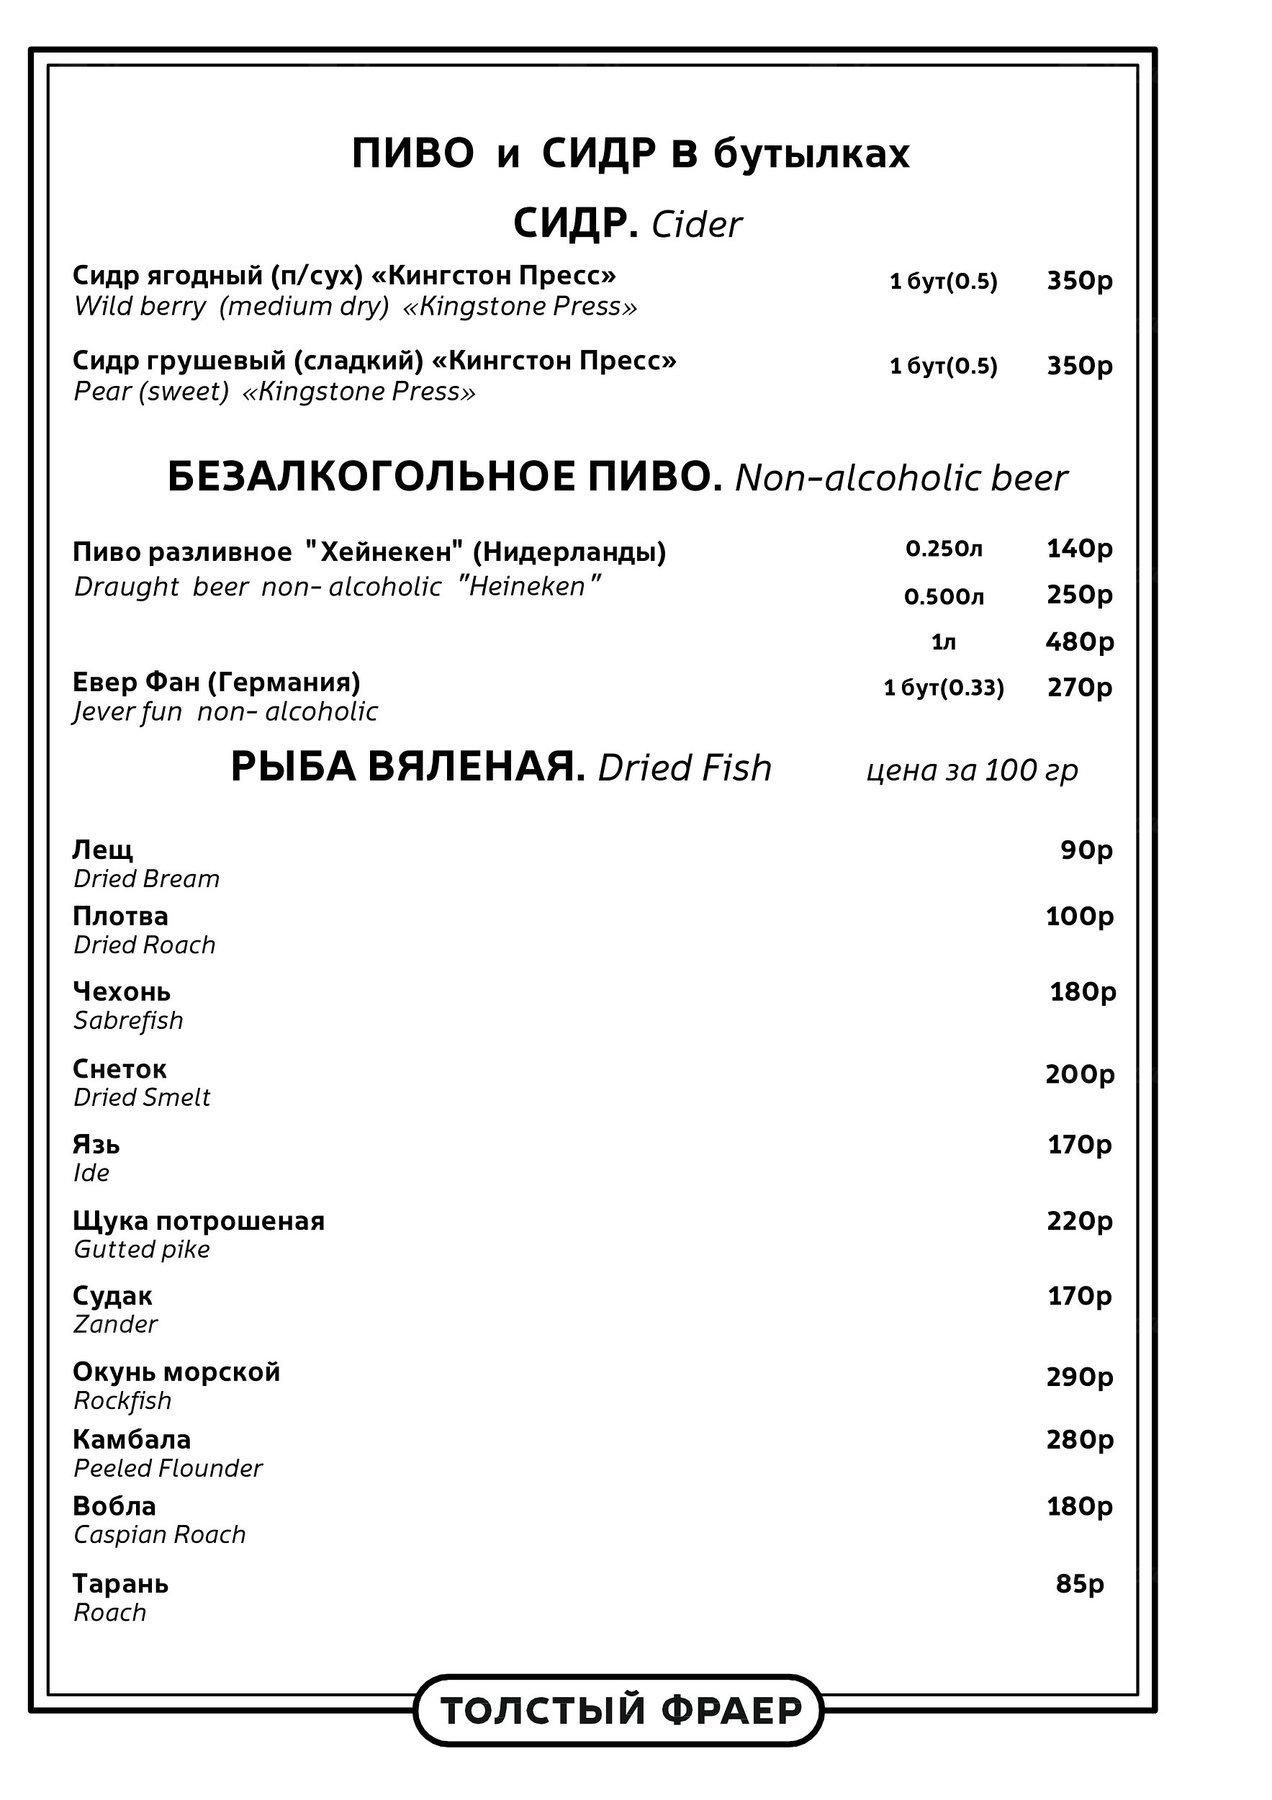 Меню ресторана Толстый Фраер на проспекте Луначарского фото 2